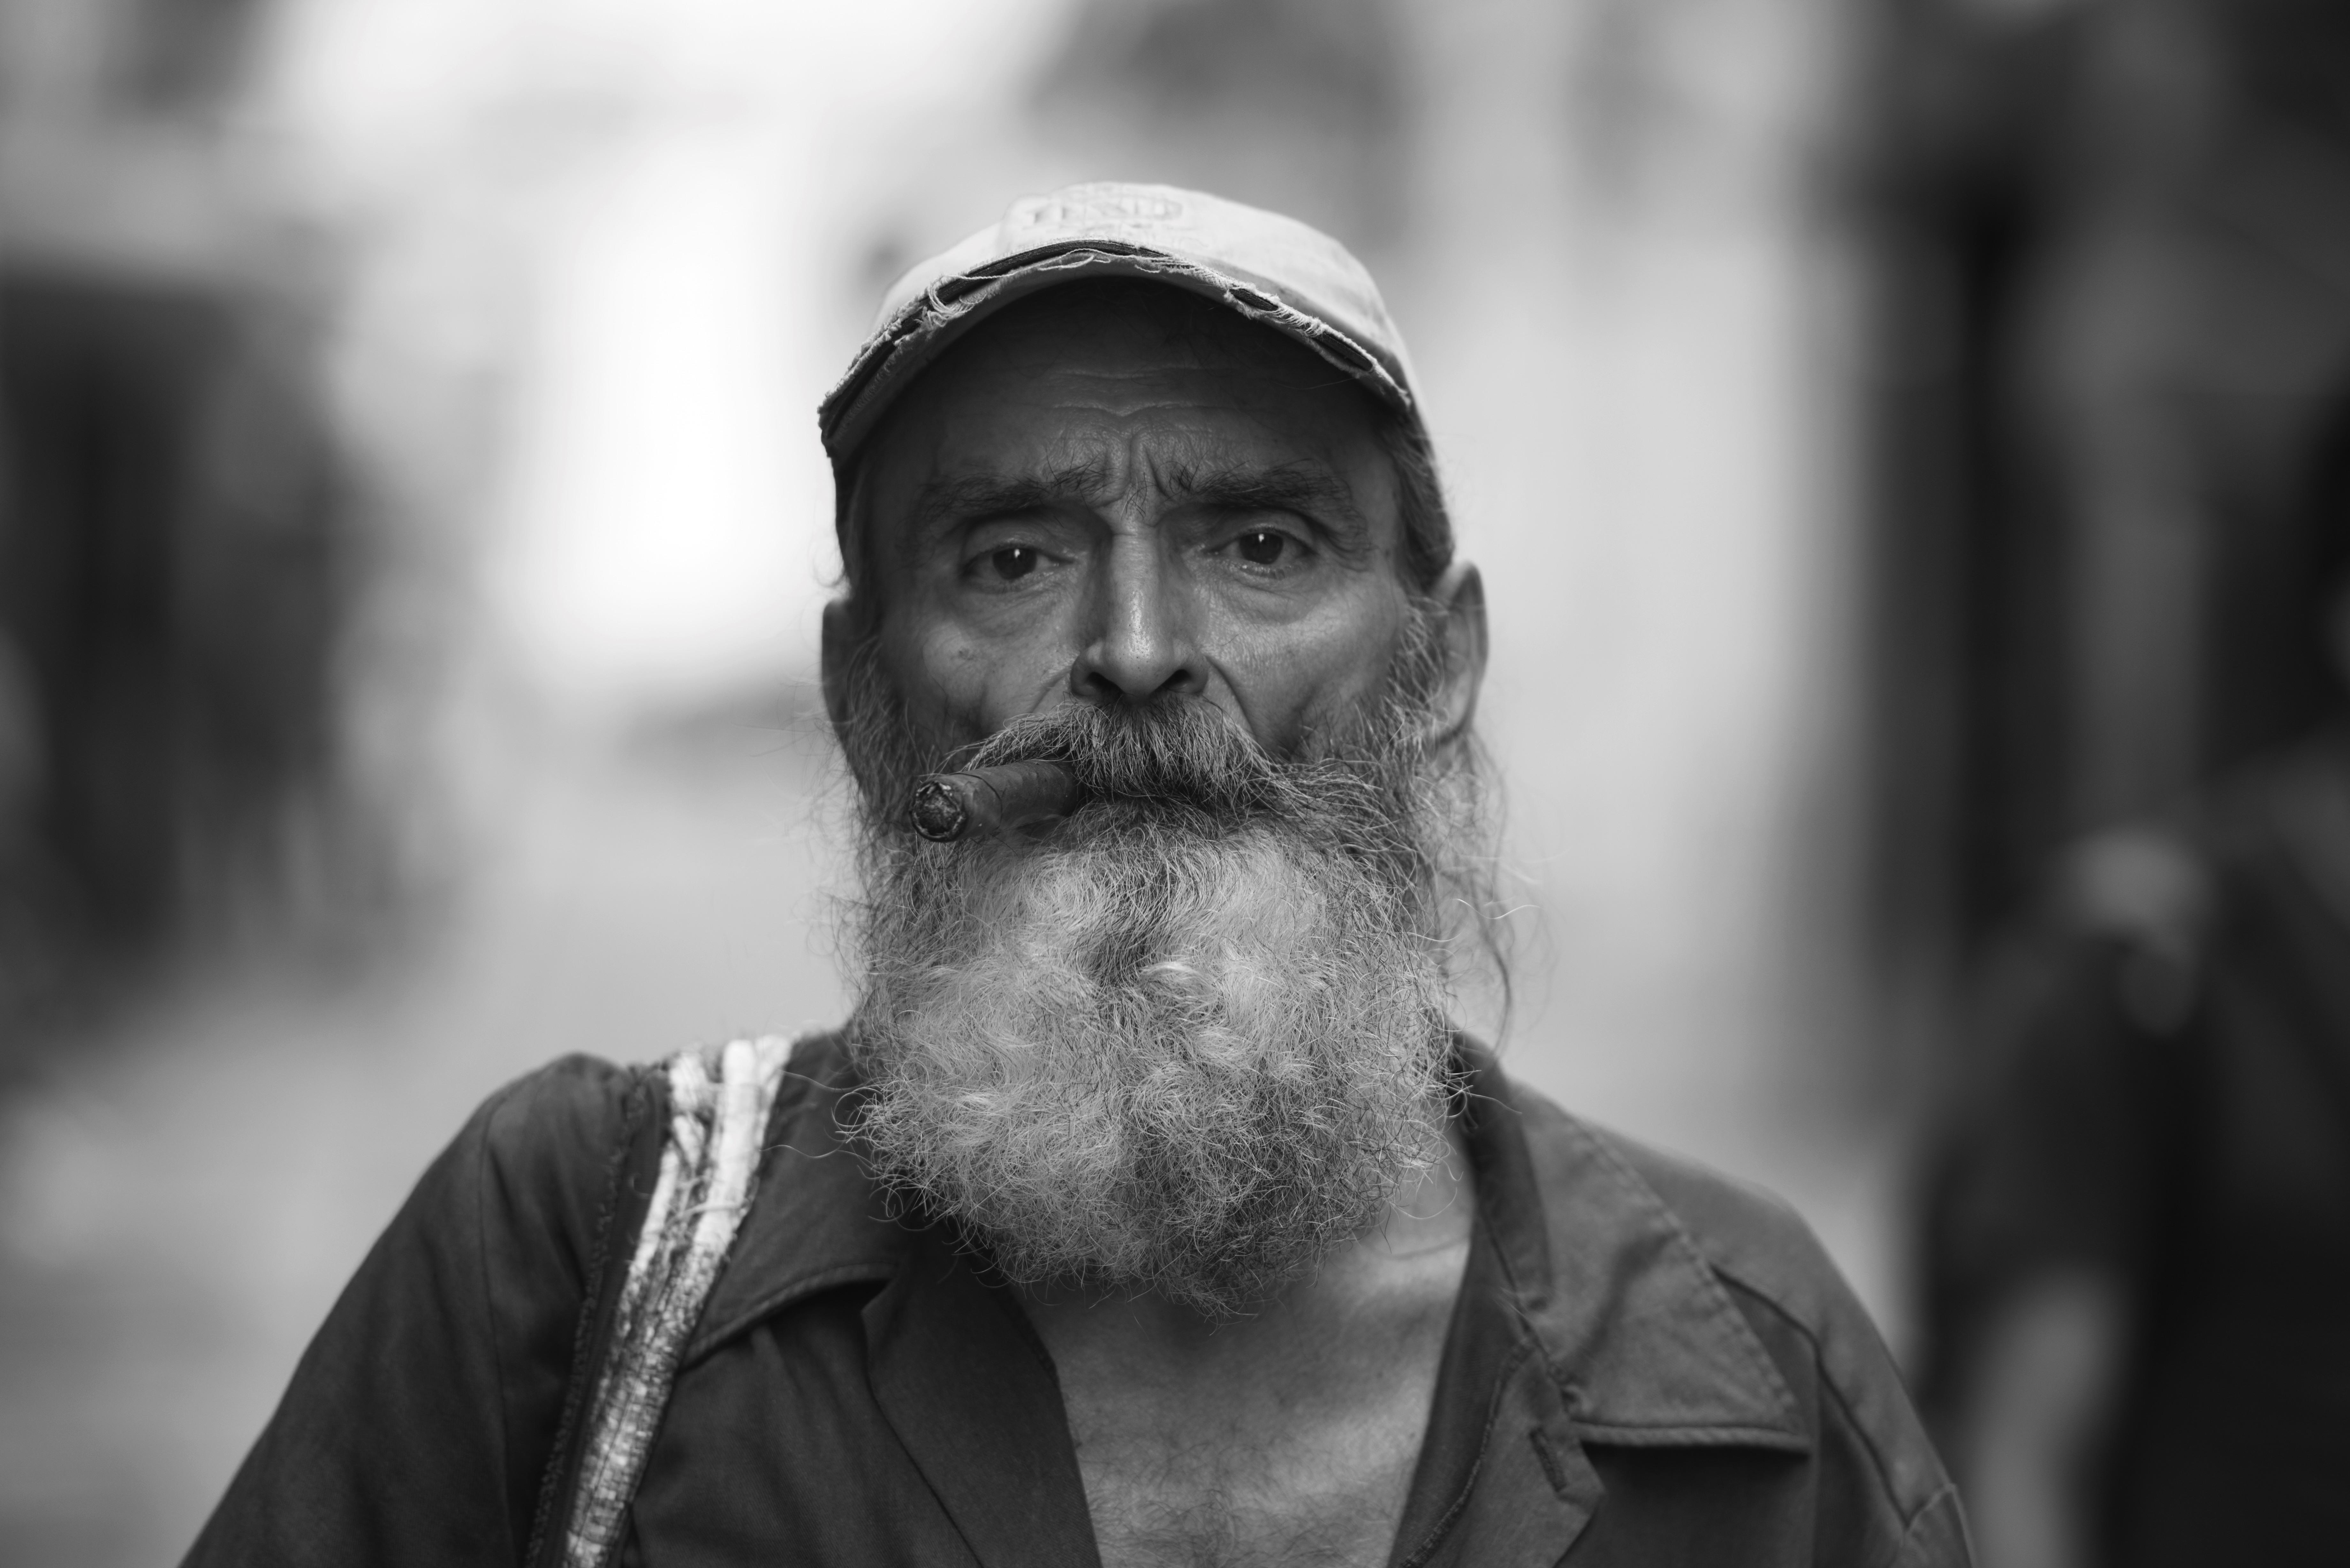 Habana Newspaper Man 2